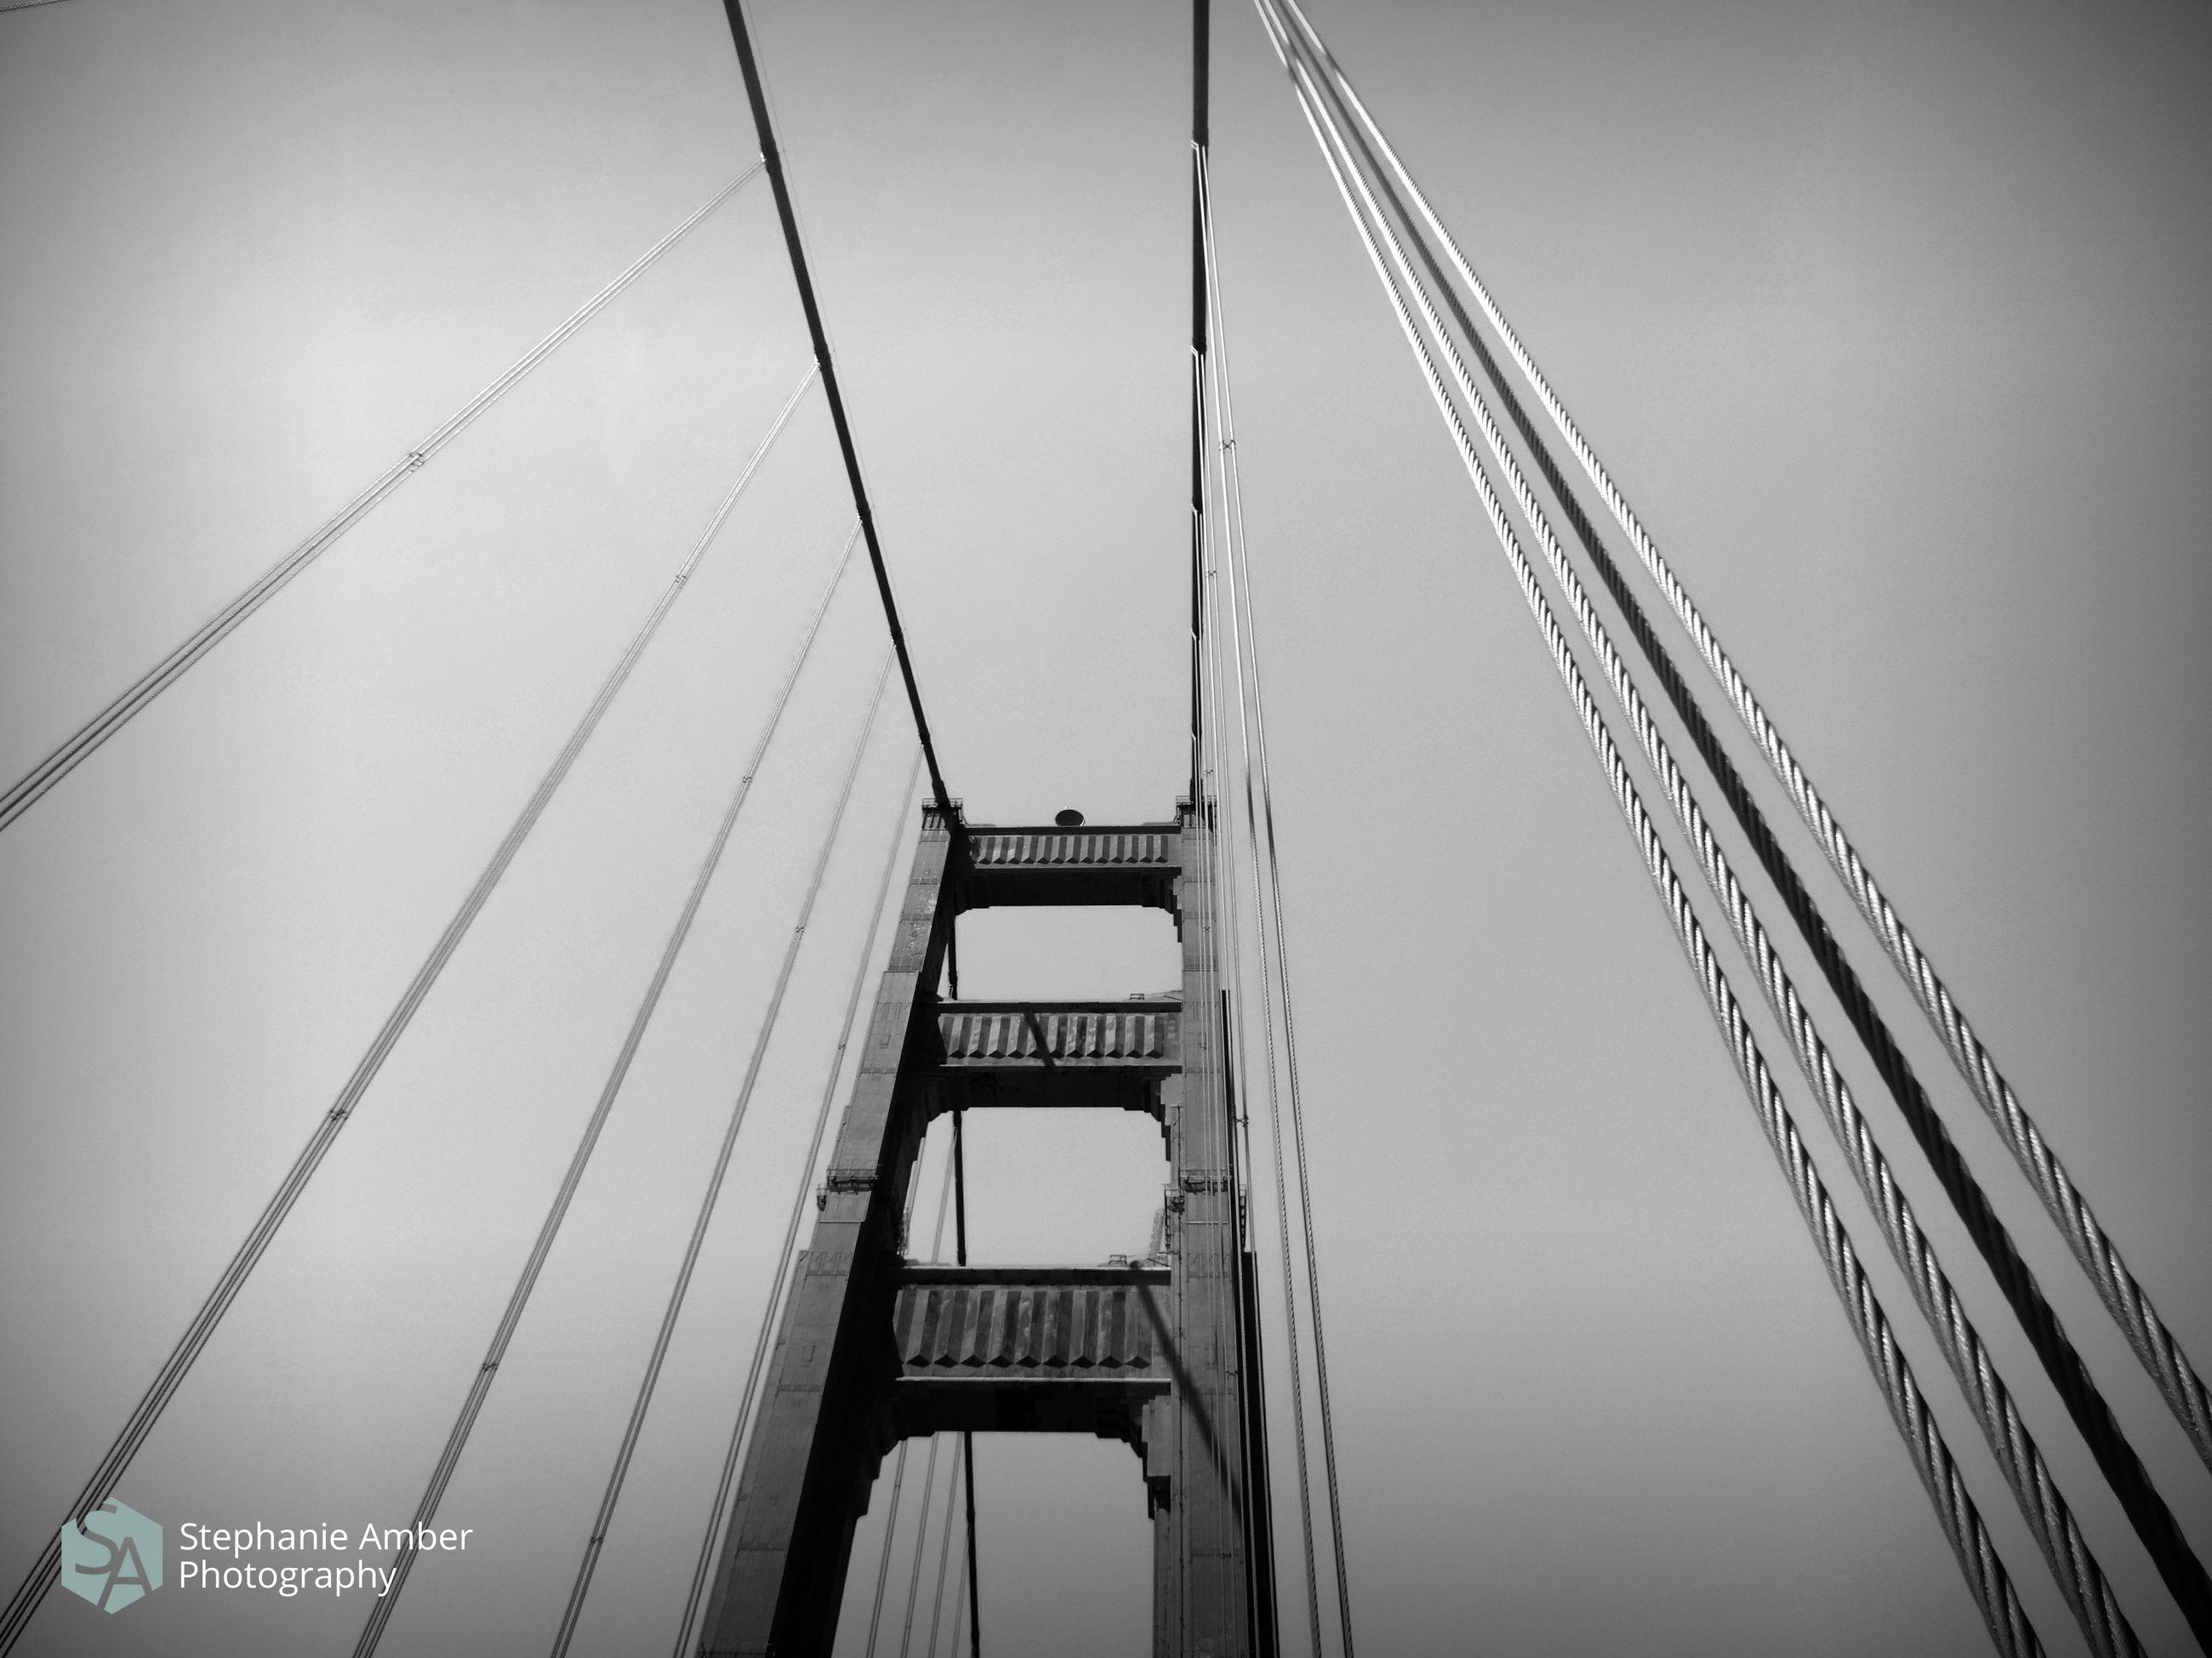 bridge, built structure, architecture, engineering, suspension bridge, bridge - man made structure, sky, connection, low angle view, transportation, cable, steel cable, nature, cable-stayed bridge, travel destinations, travel, tourism, city, skyscraper